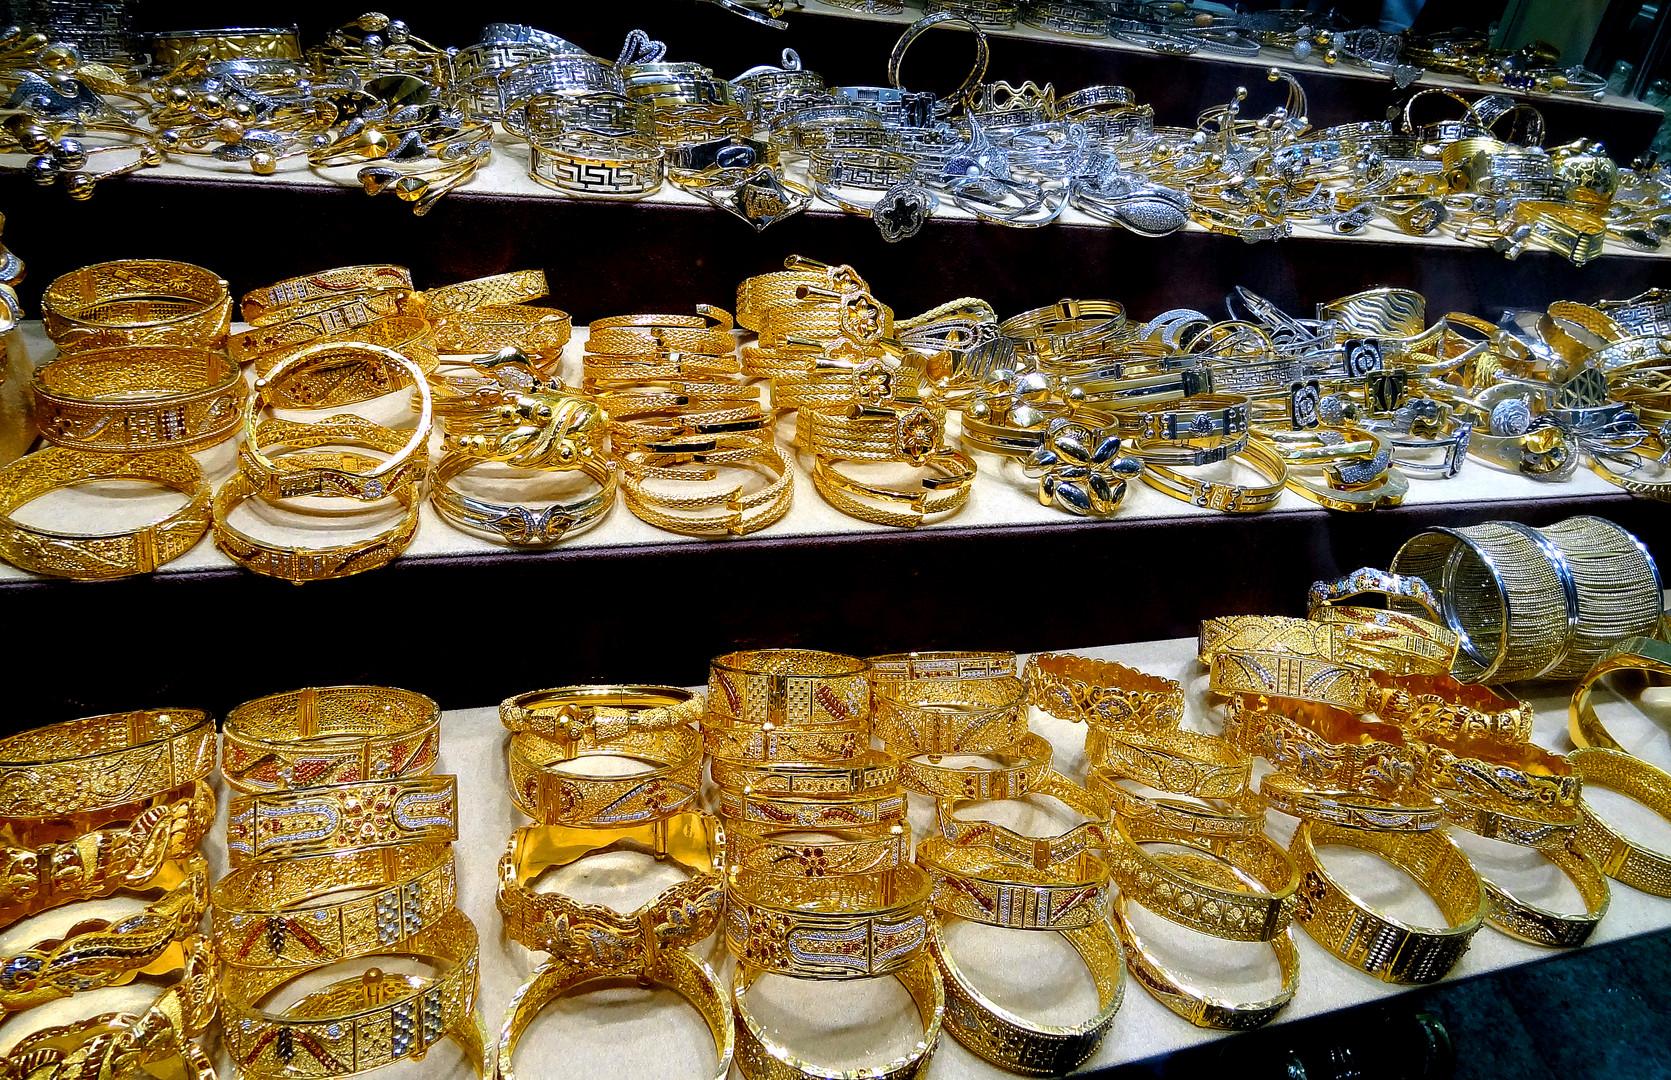 VAE/Dubai-City of Gold